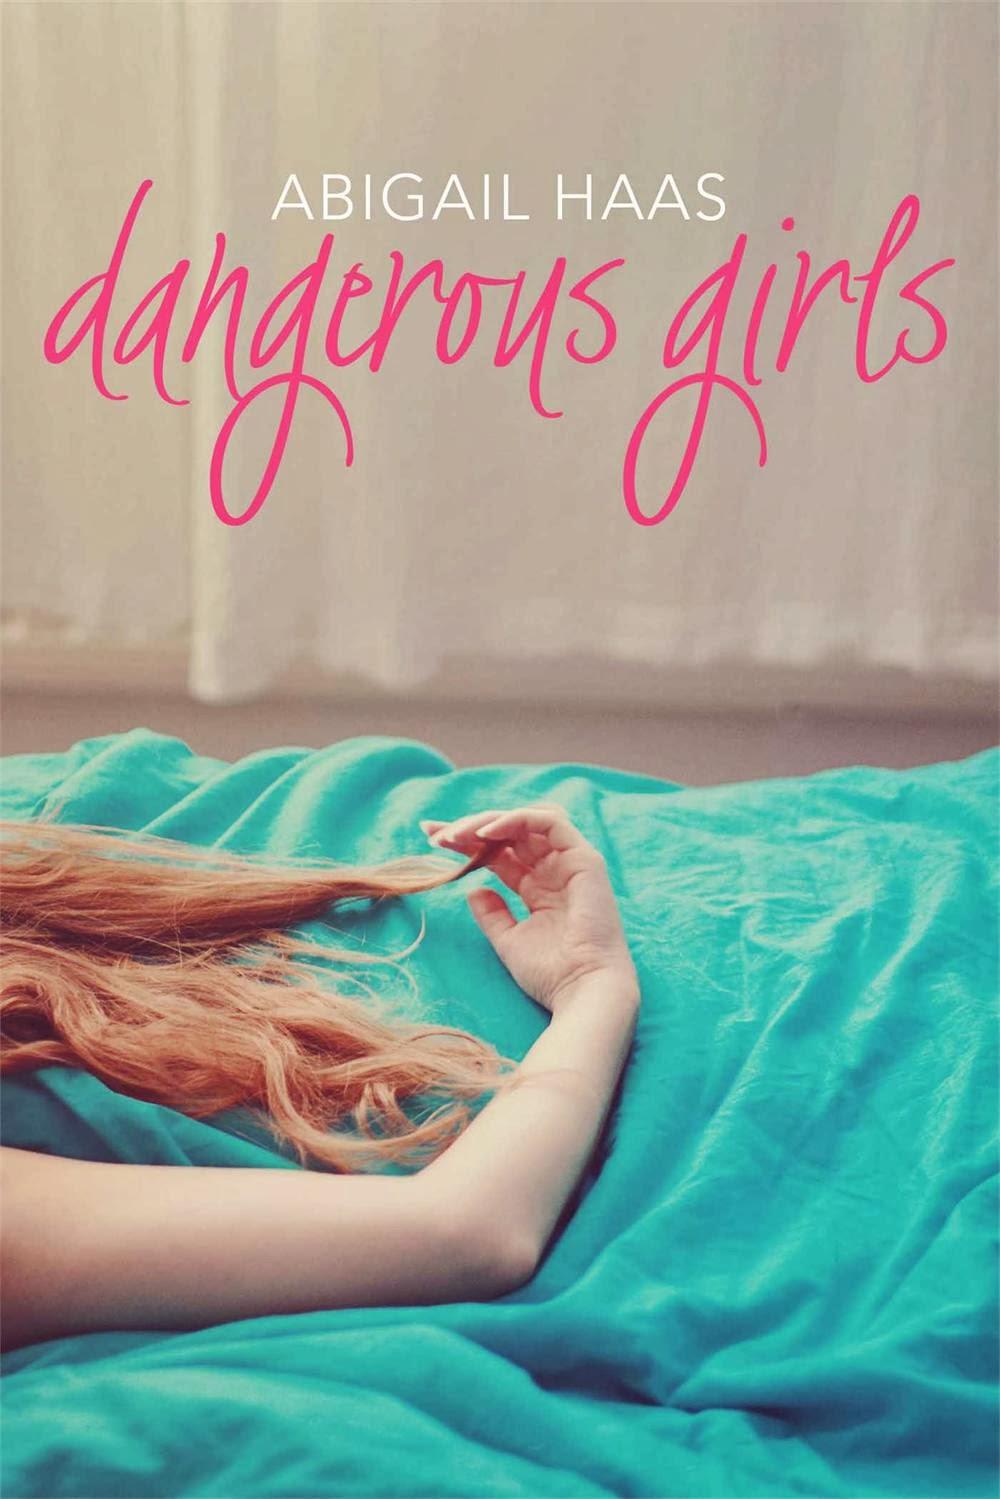 Dangerous Girls by Abigail Haas - Paperback Edition